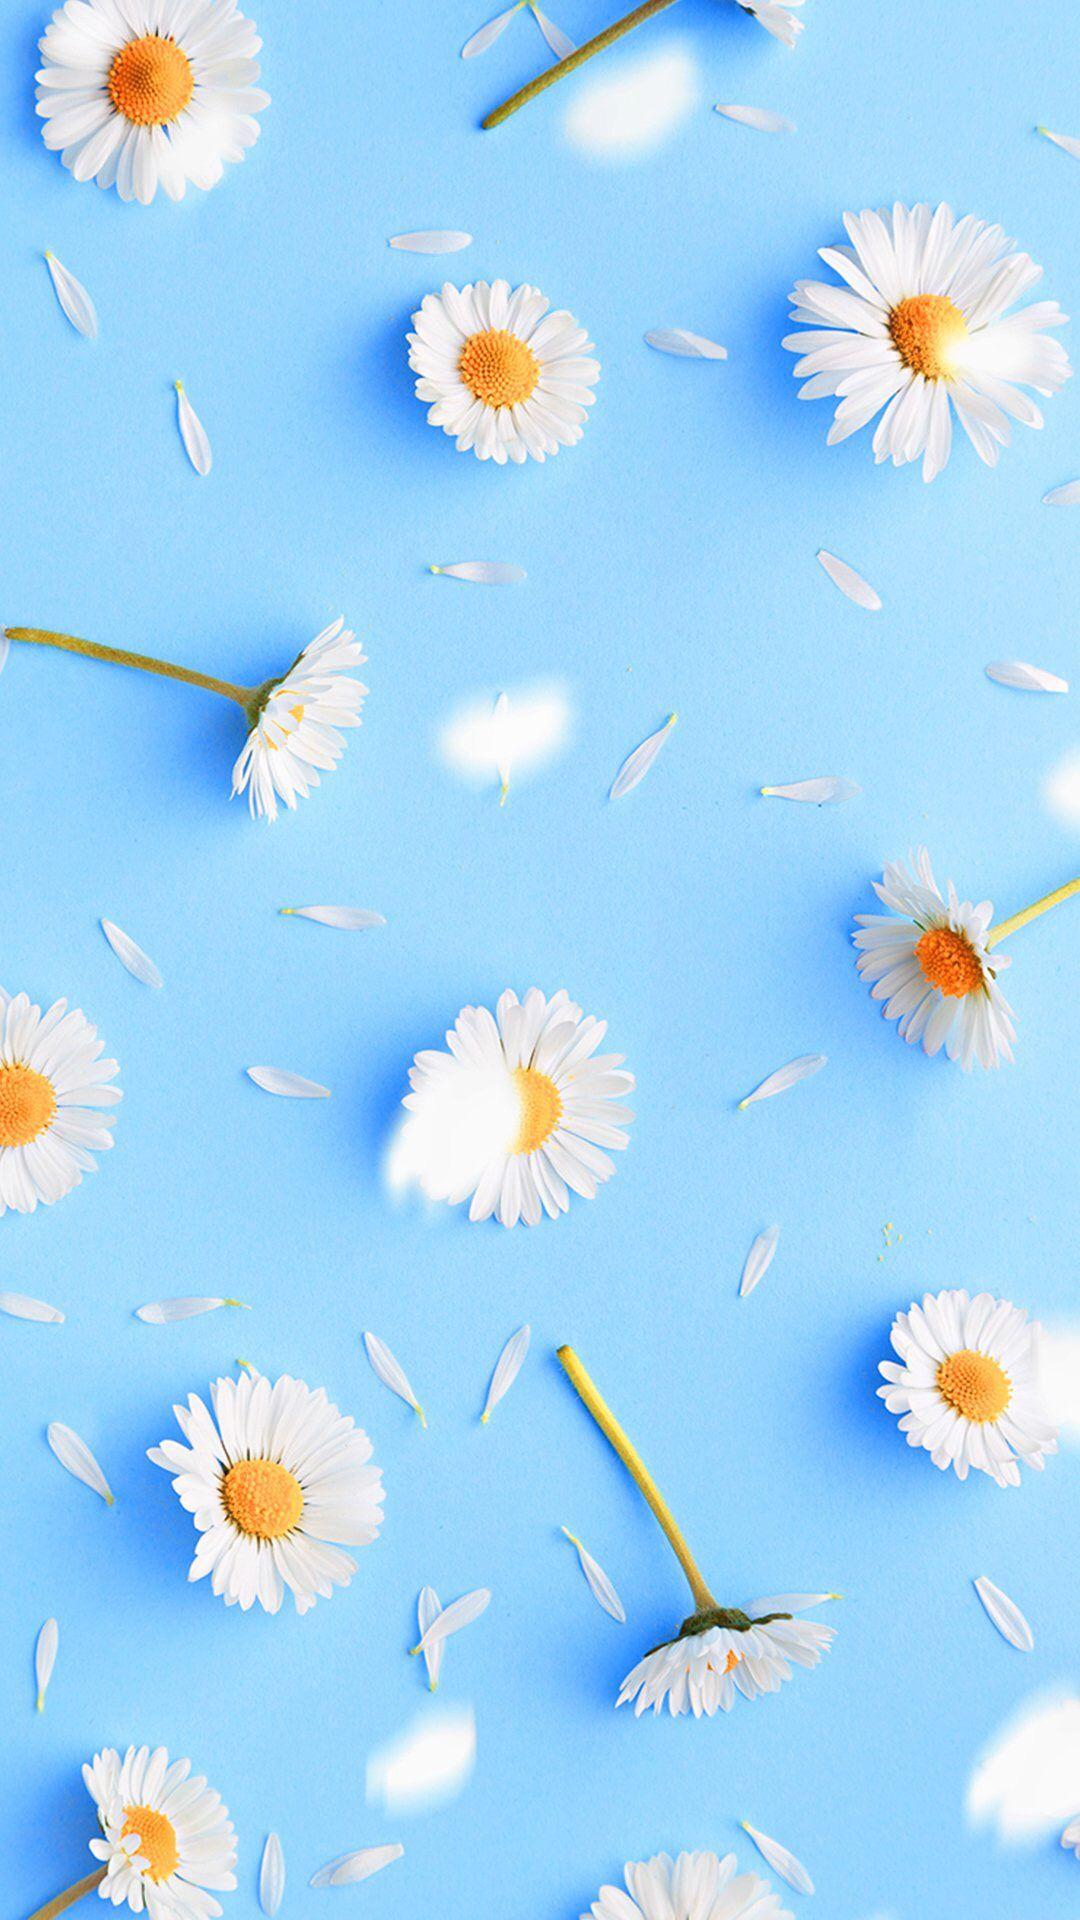 Daisy iPhone wallpaper